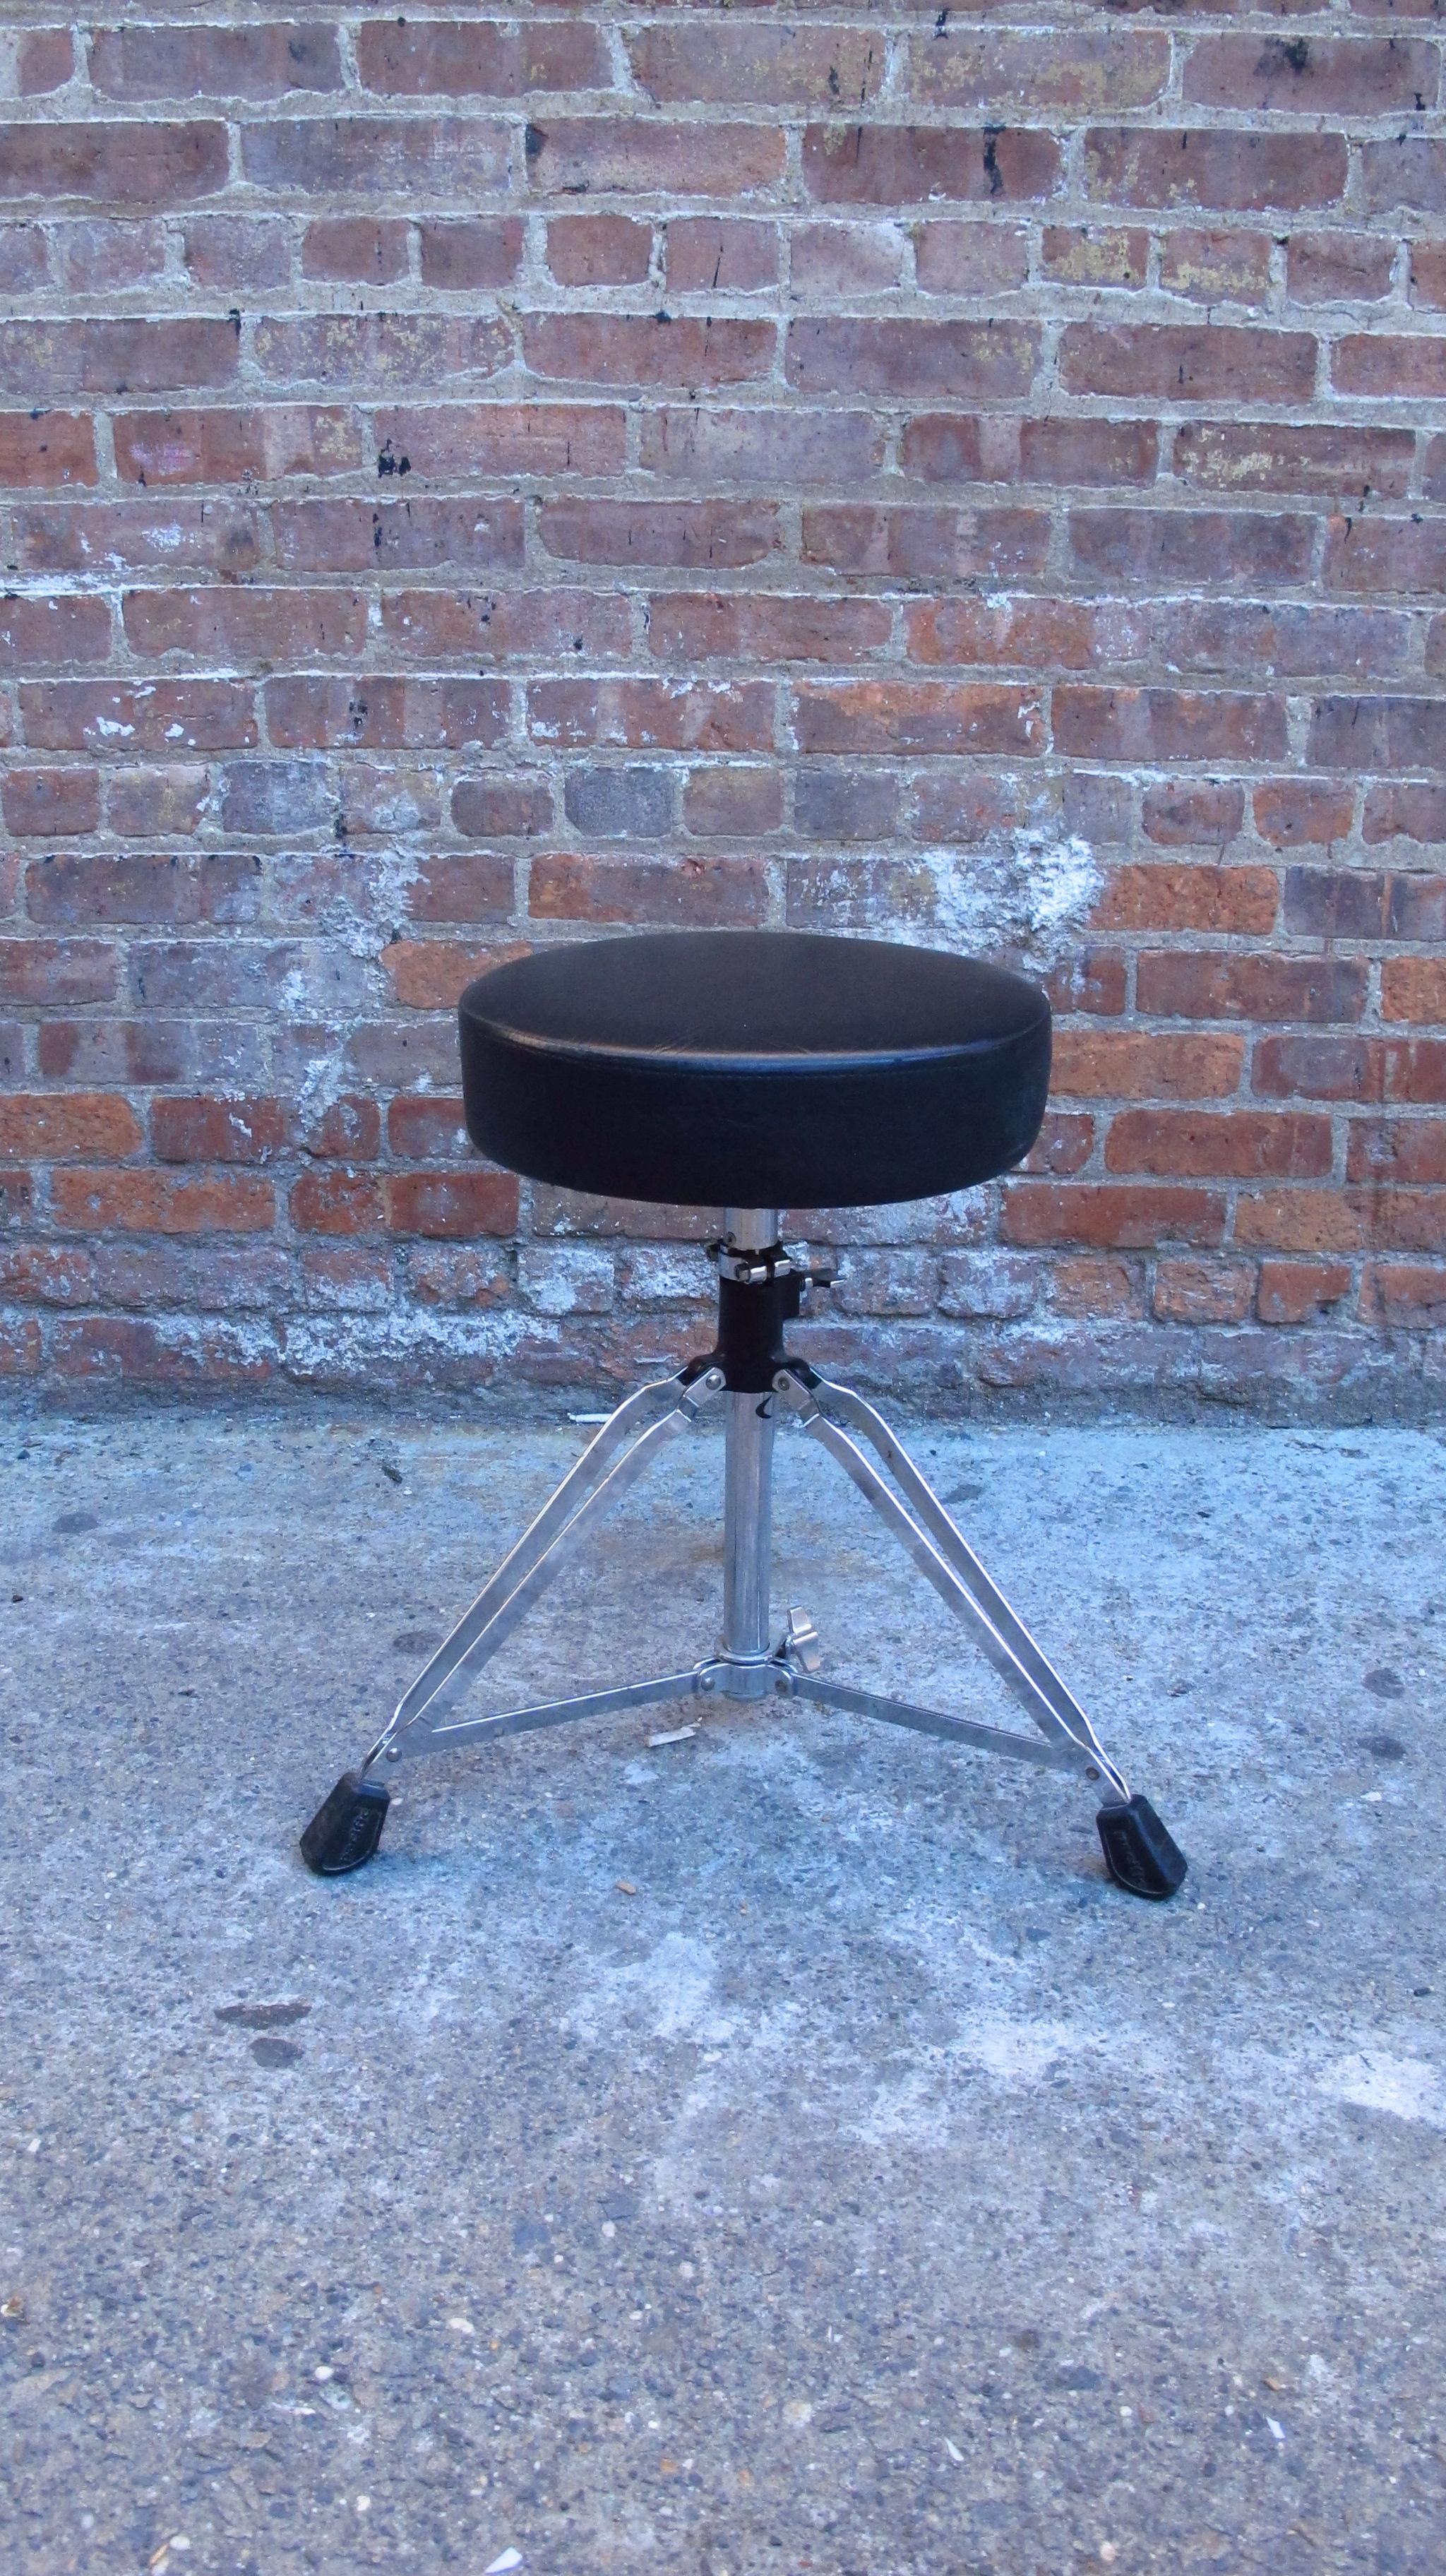 Black Musician's Seat $30